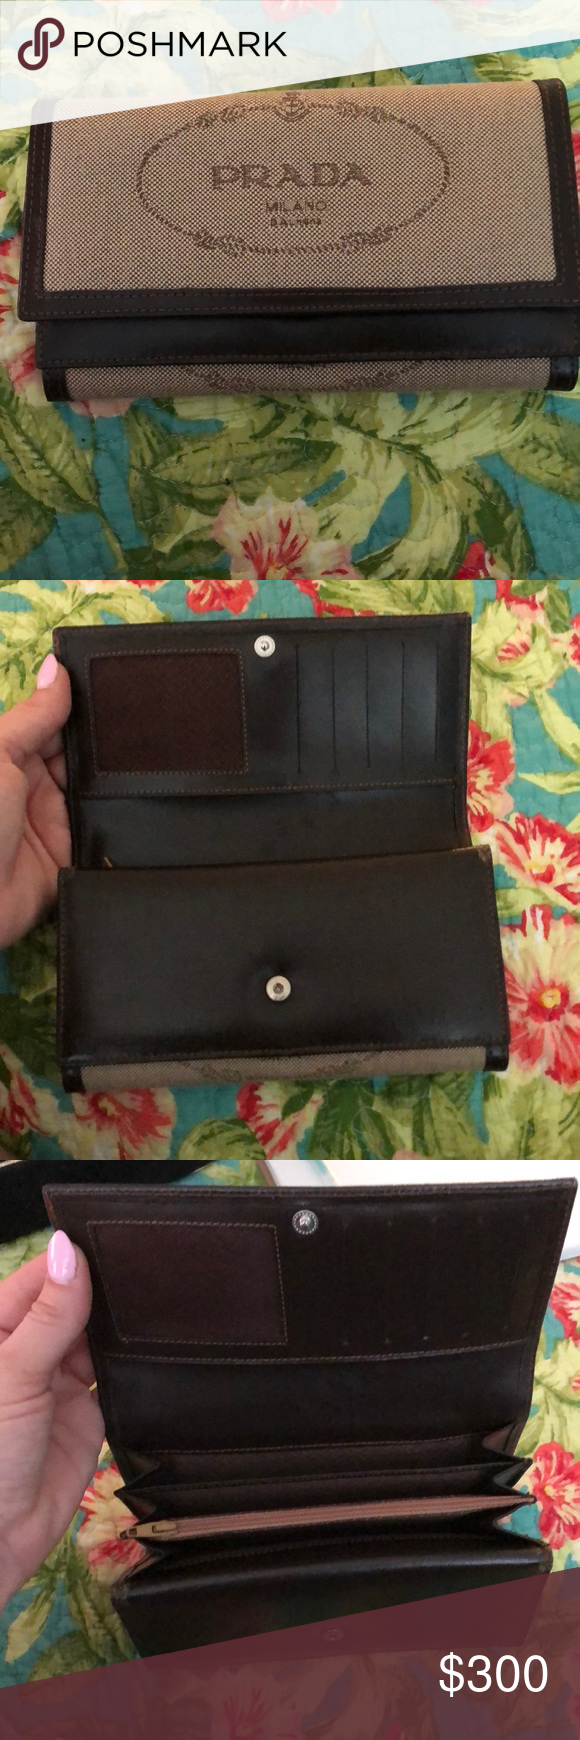 fe182130907e Vintage Prada Milano wallet In brand new condition , Vintage authentic Prada  Milano DAL 1913 ladies wallet . Amazing condition . Prada Bags Wallets